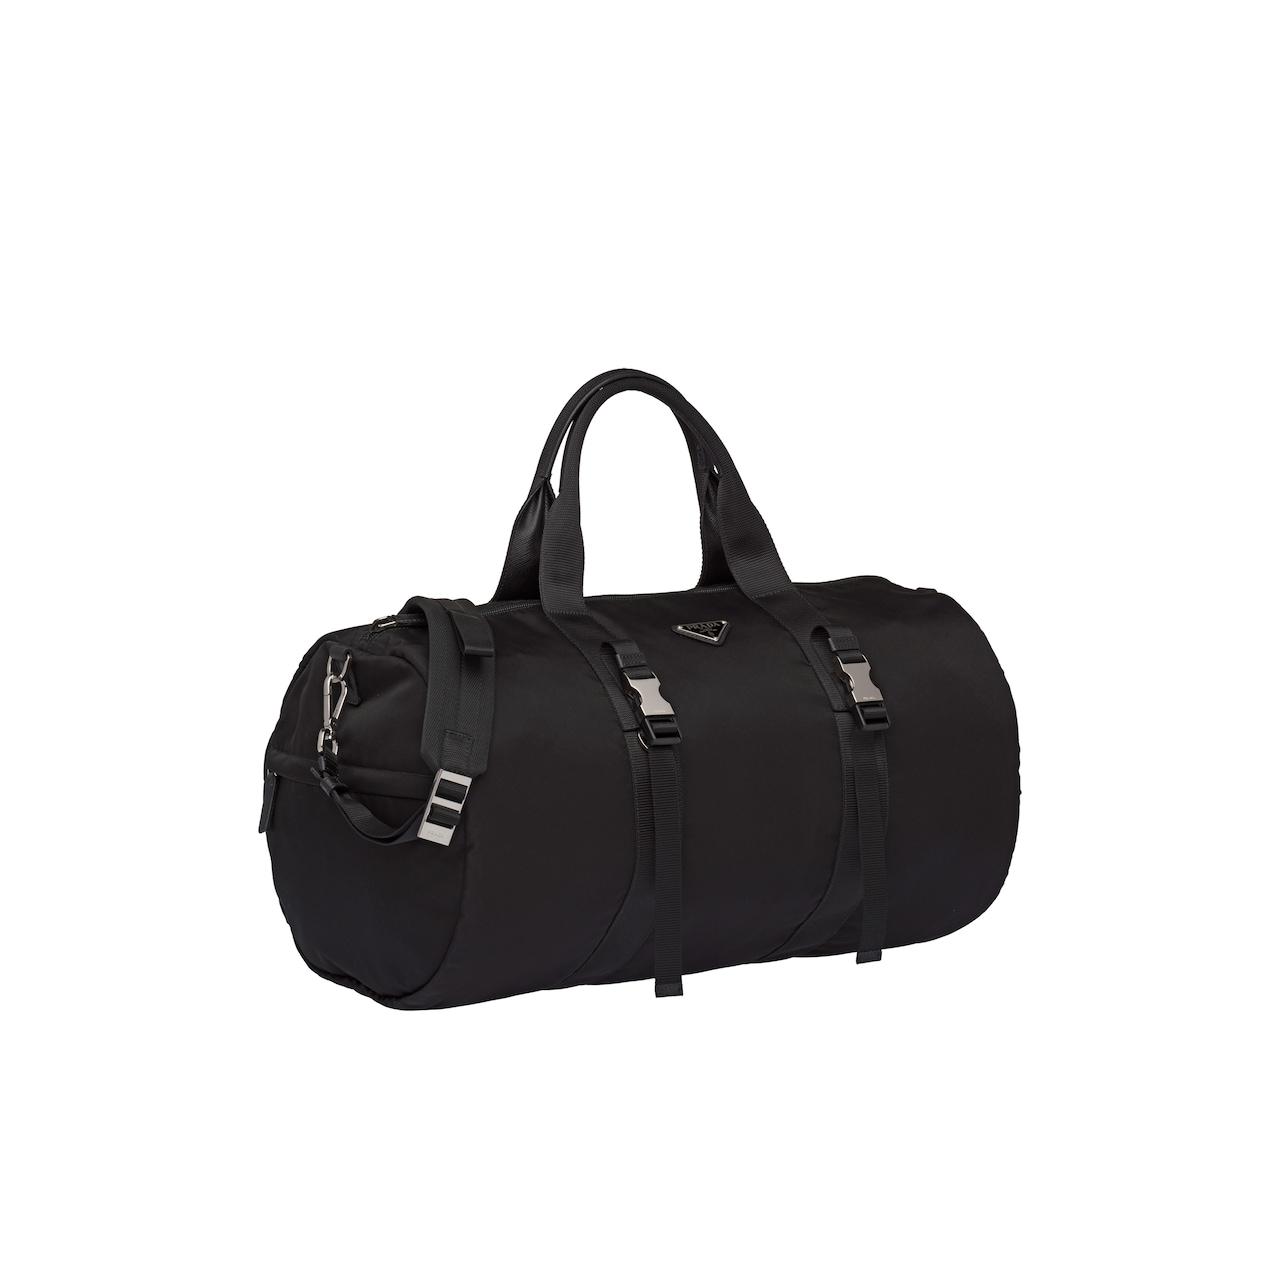 Nylon and Saffiano leather duffel bag